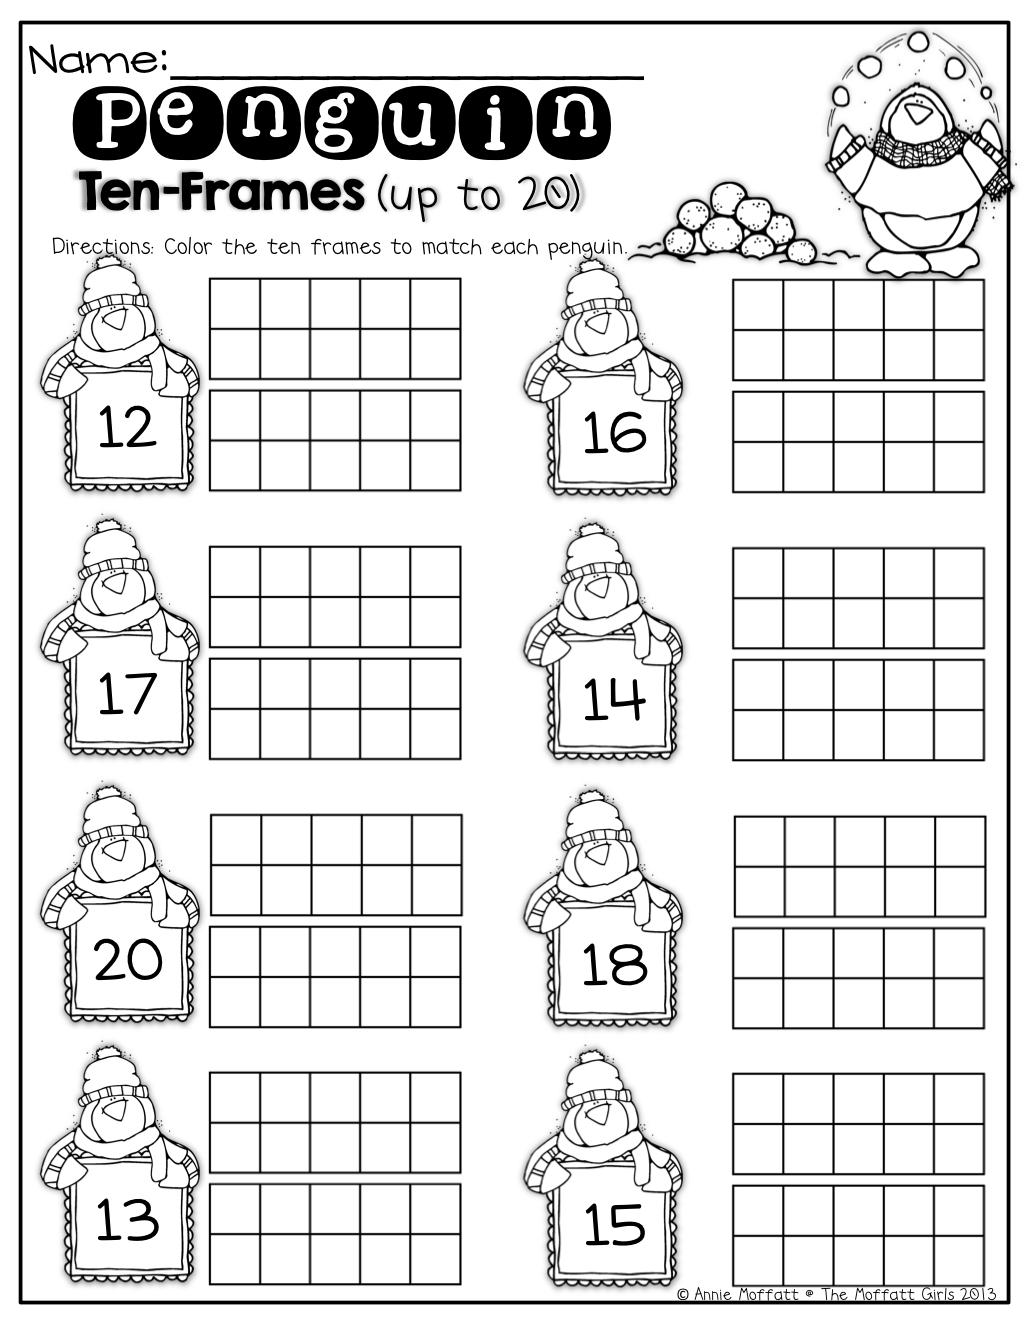 Penguin Ten Frames Up To 20 Math Kindergarten Math Kindergarten Math Kindergarten Math Ten Frames Ten Frames Kindergarten [ 1325 x 1024 Pixel ]